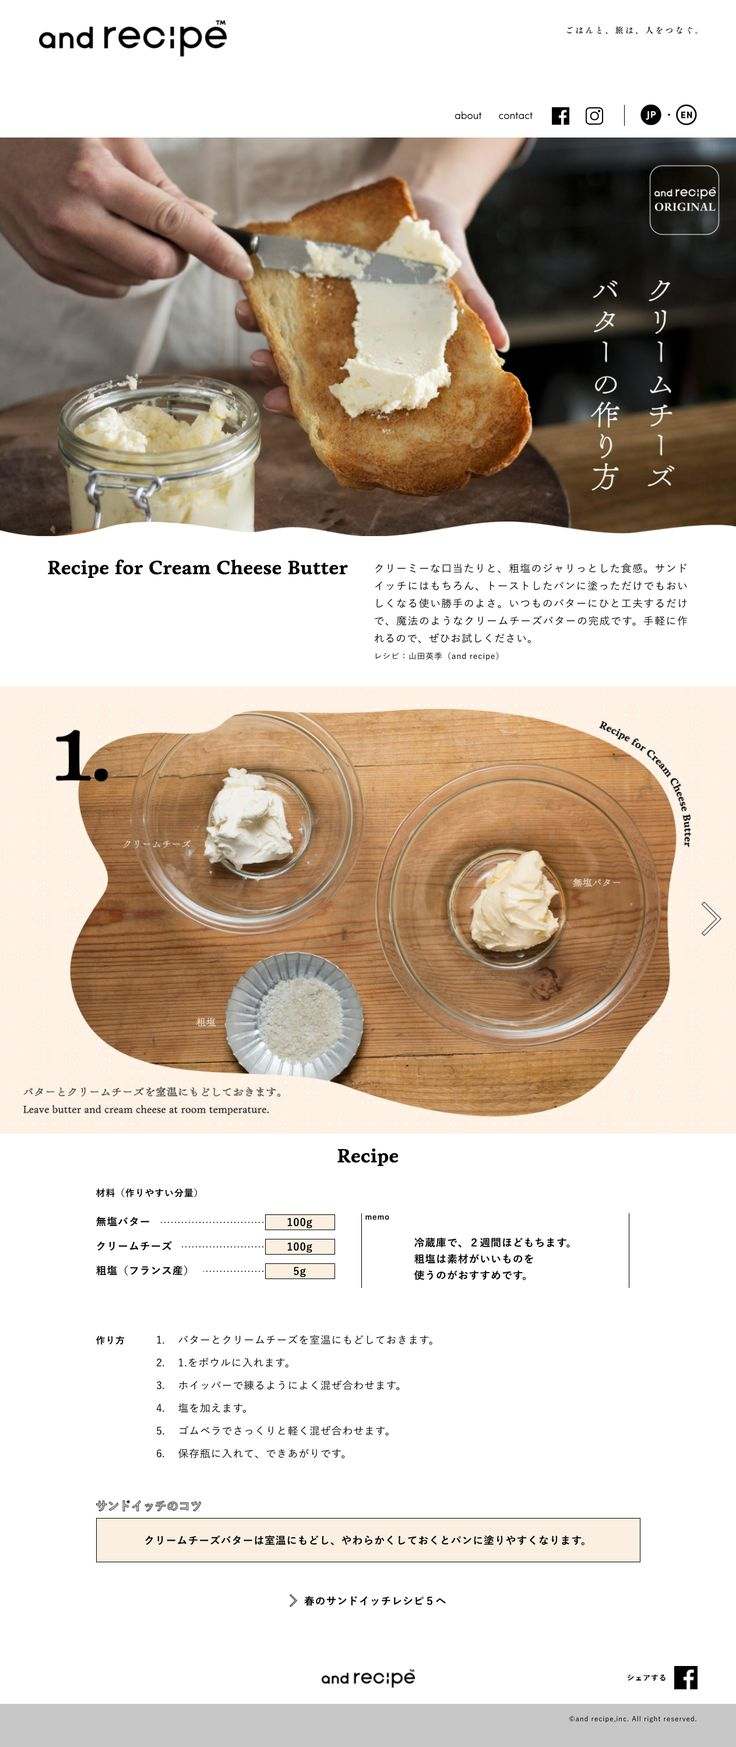 [and recipe] web magazine 3 | キタダデザイン